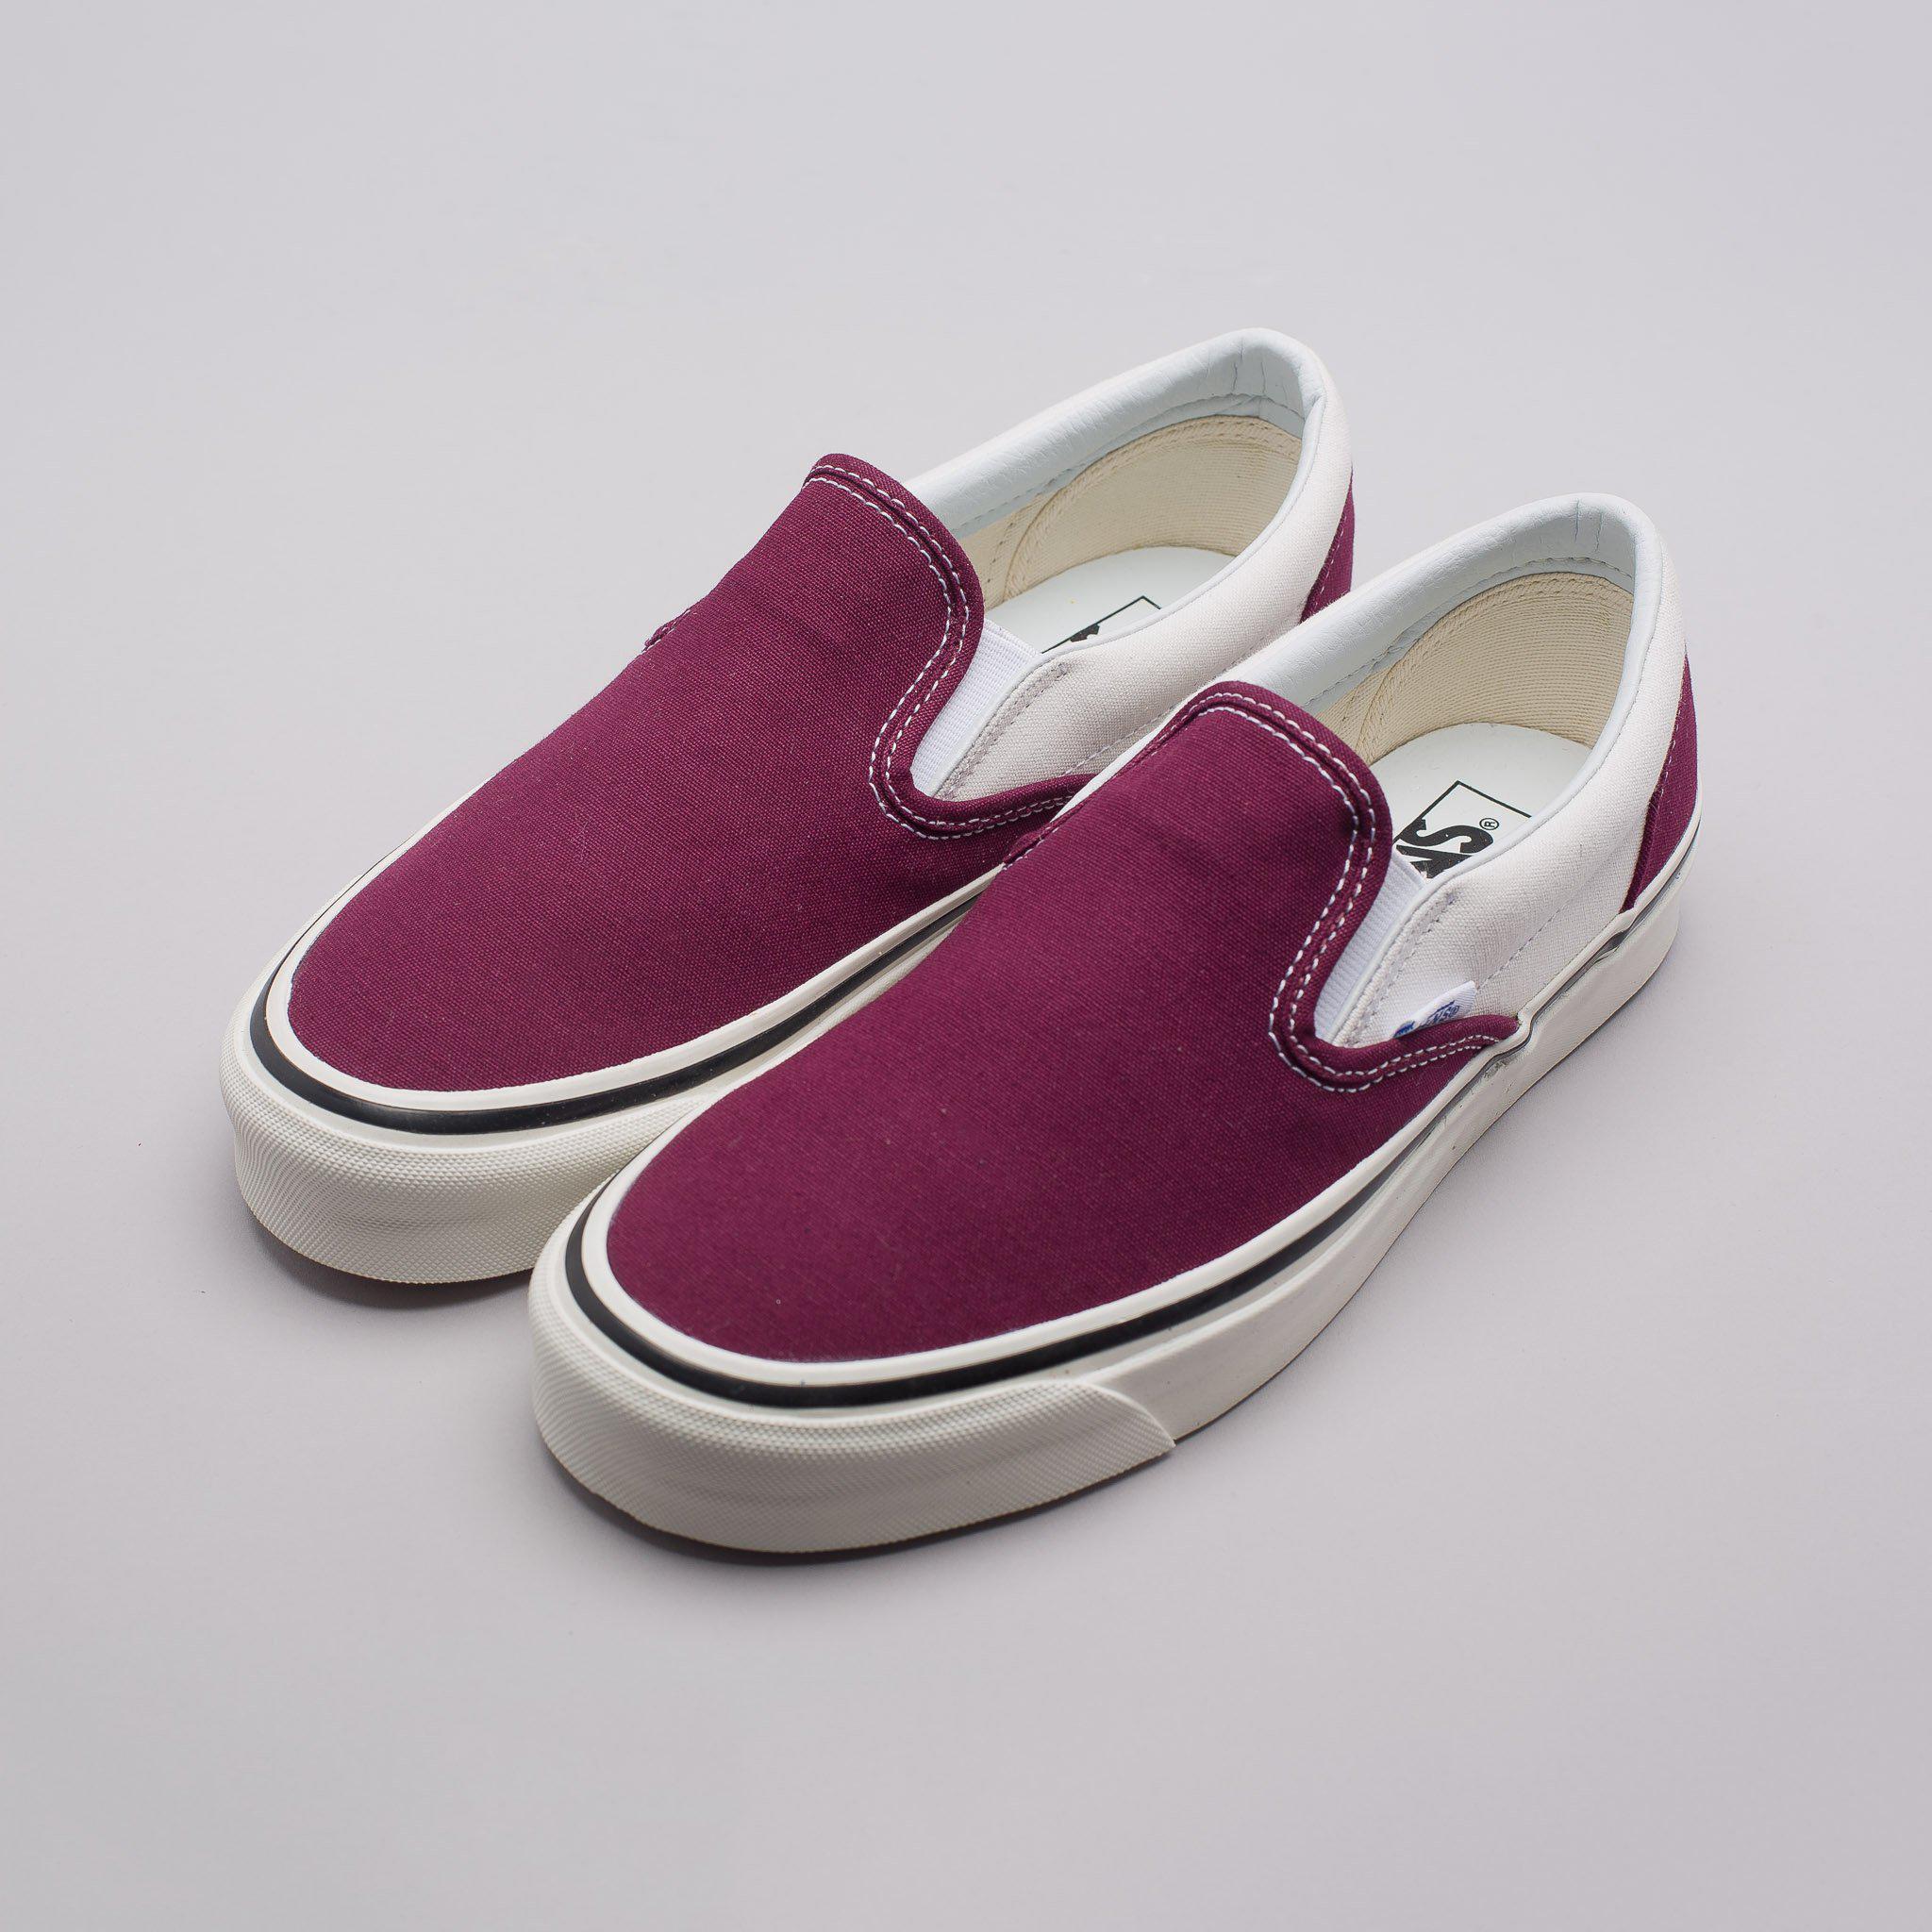 vans burgundy slip on shoes